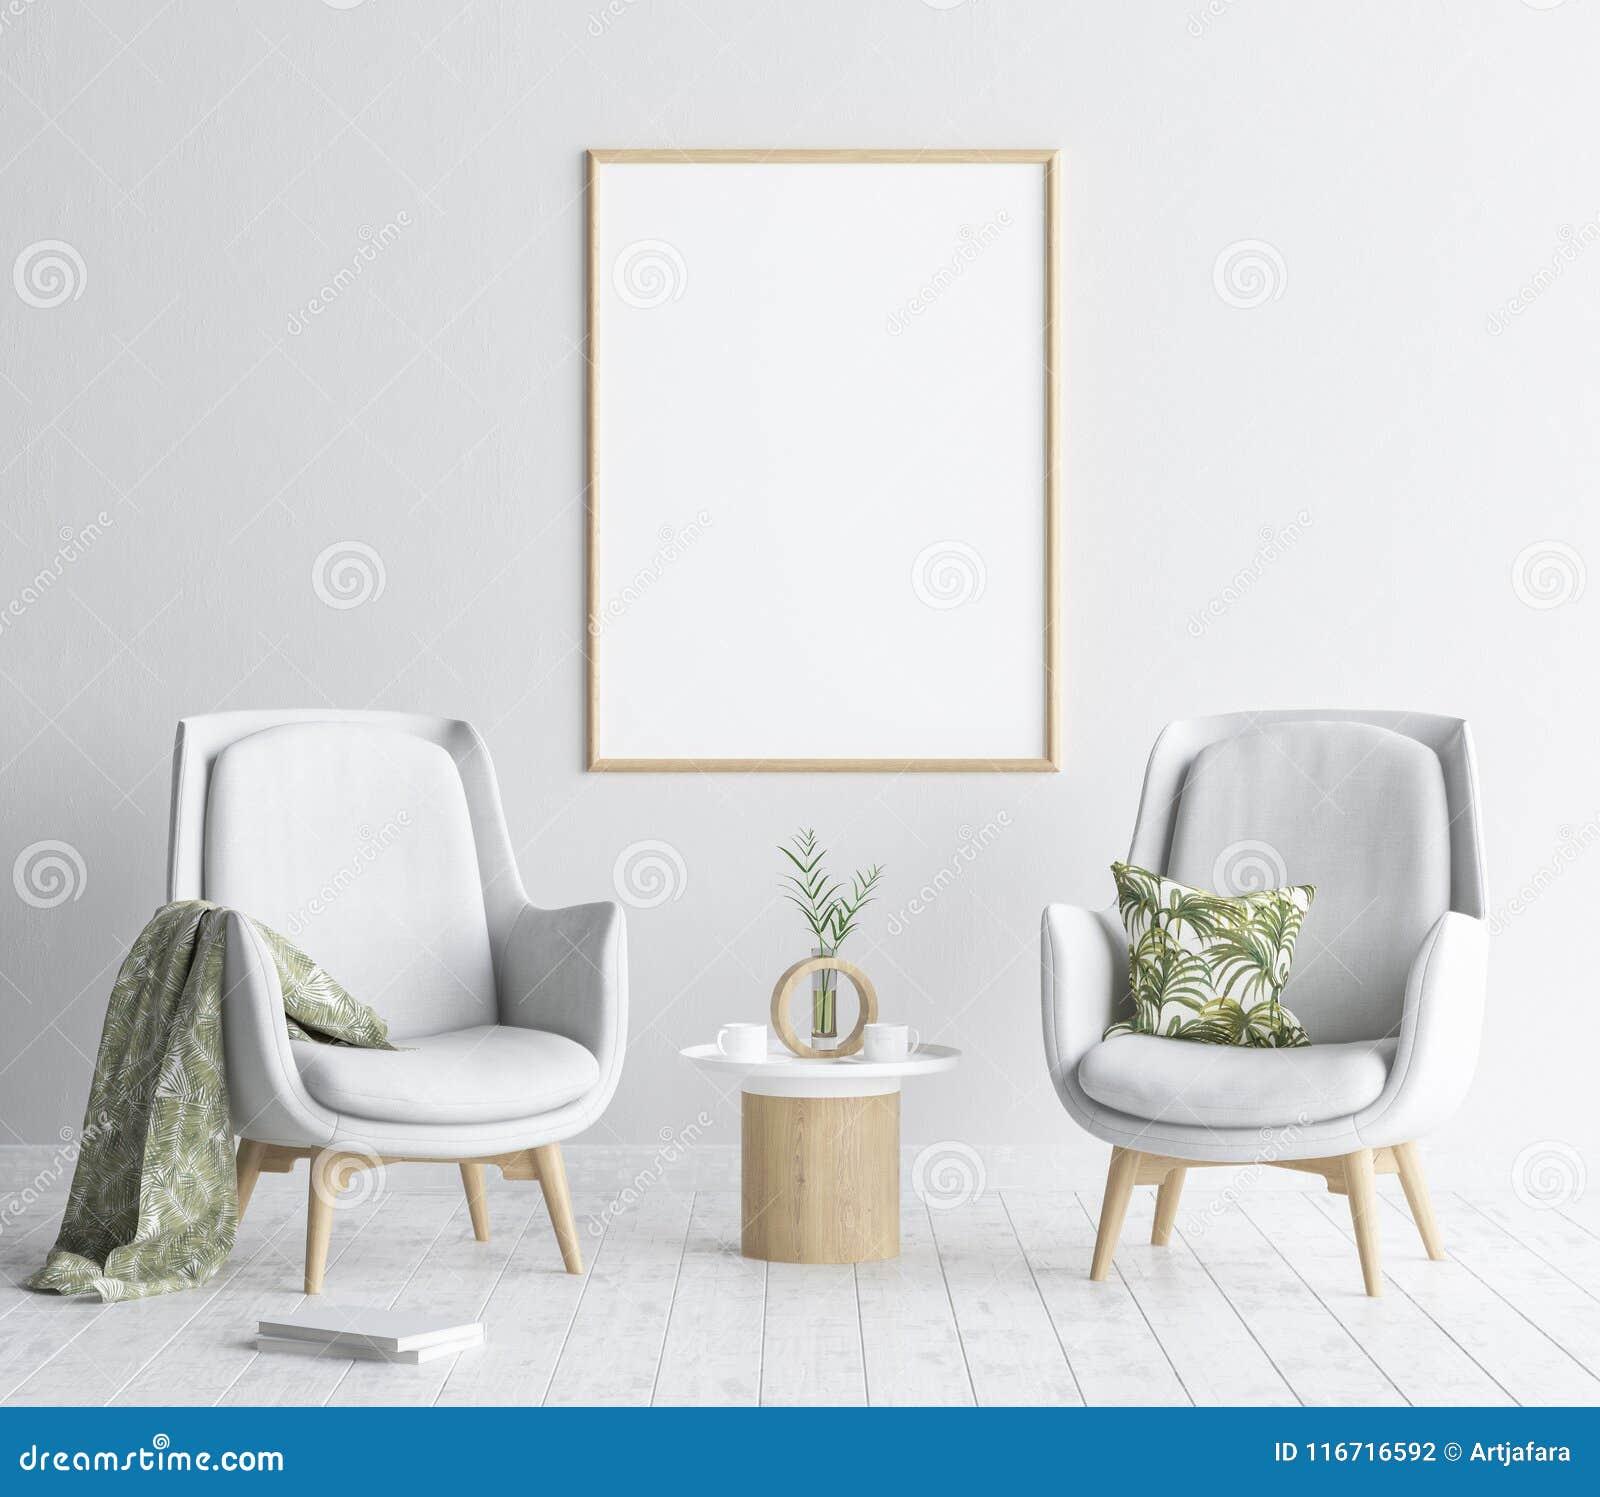 Mock up poster frame in living room background, Scandinavian style interior